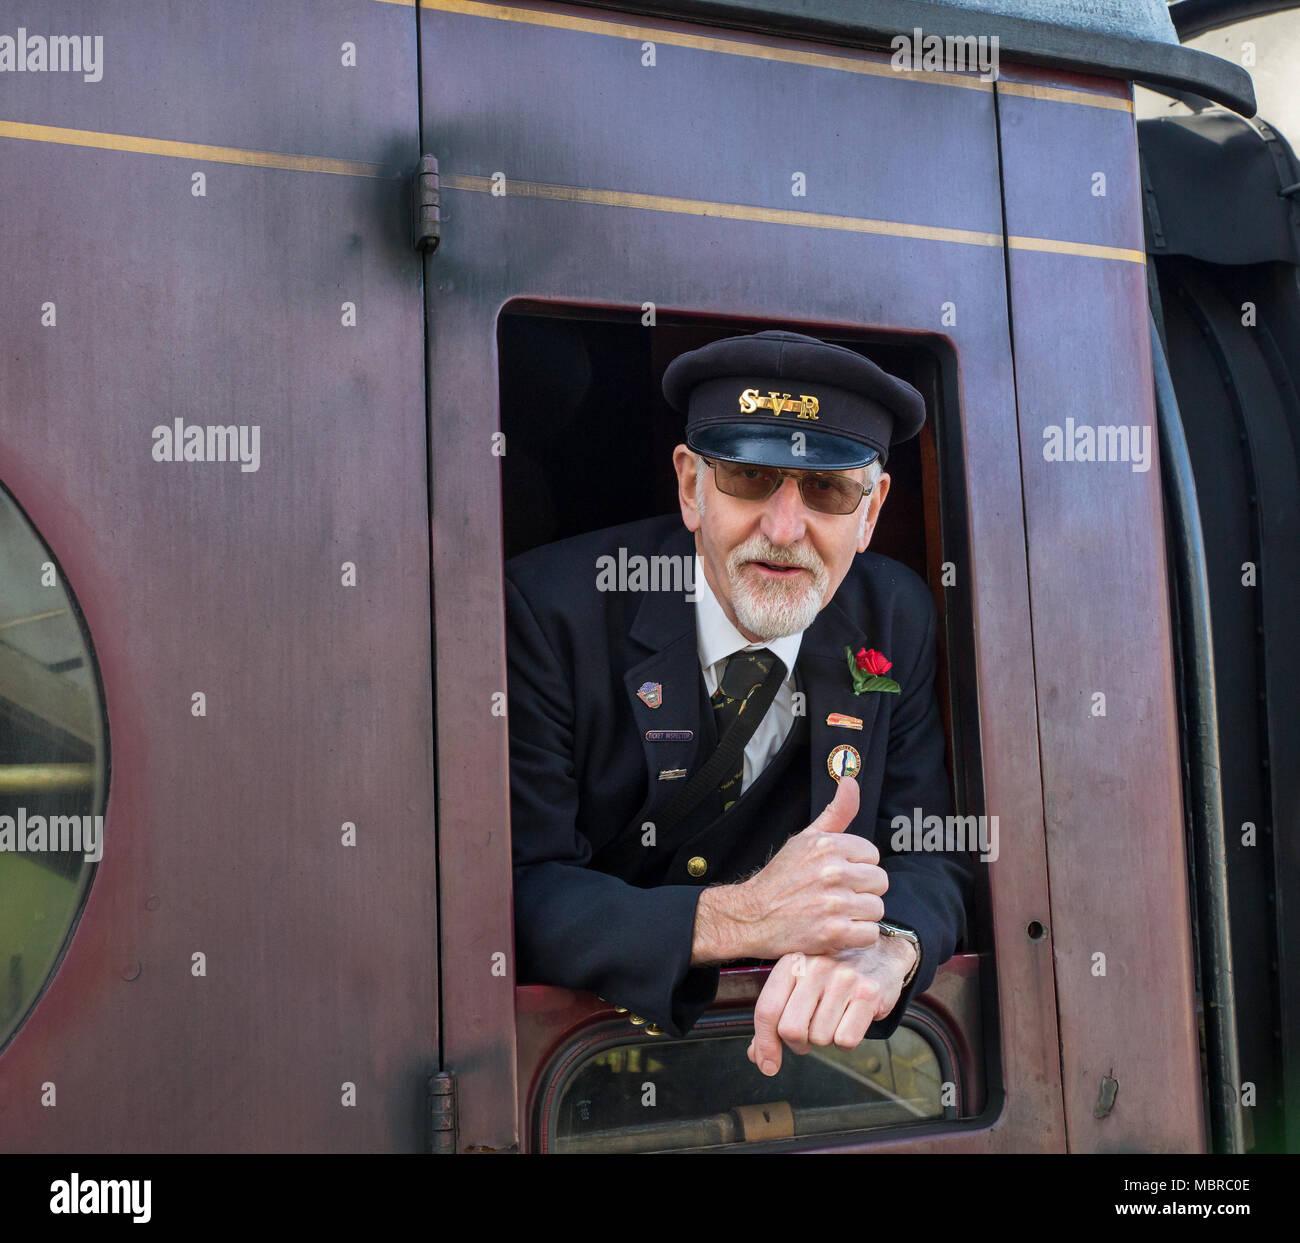 Cerca de Jolly SVR guardia, en cap oficial, capturados como él se asoma de carro que pasa dando un feliz 'Thumbs up' a la plataforma preparada fotógrafo. Imagen De Stock